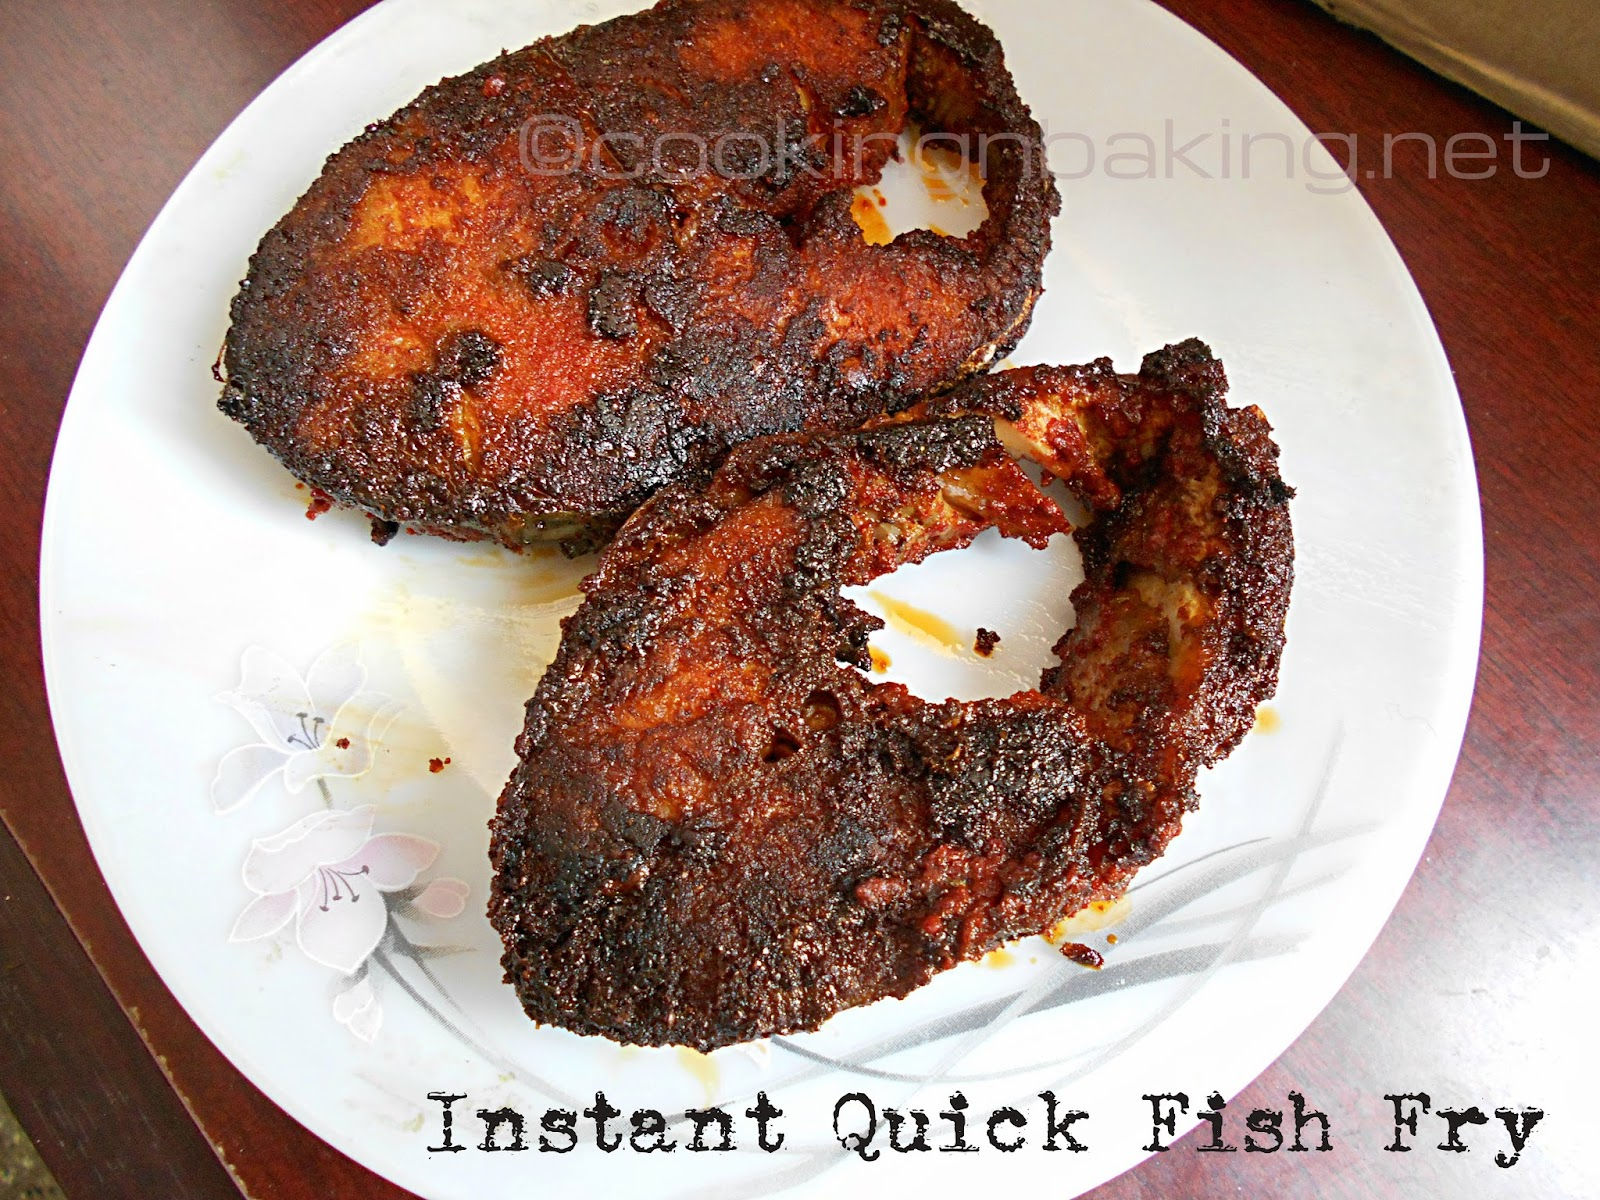 Instant King Fish Fry | Aikoora Varathadhe | How to make Instant King Fish Fry | Aikoora Varathadhe